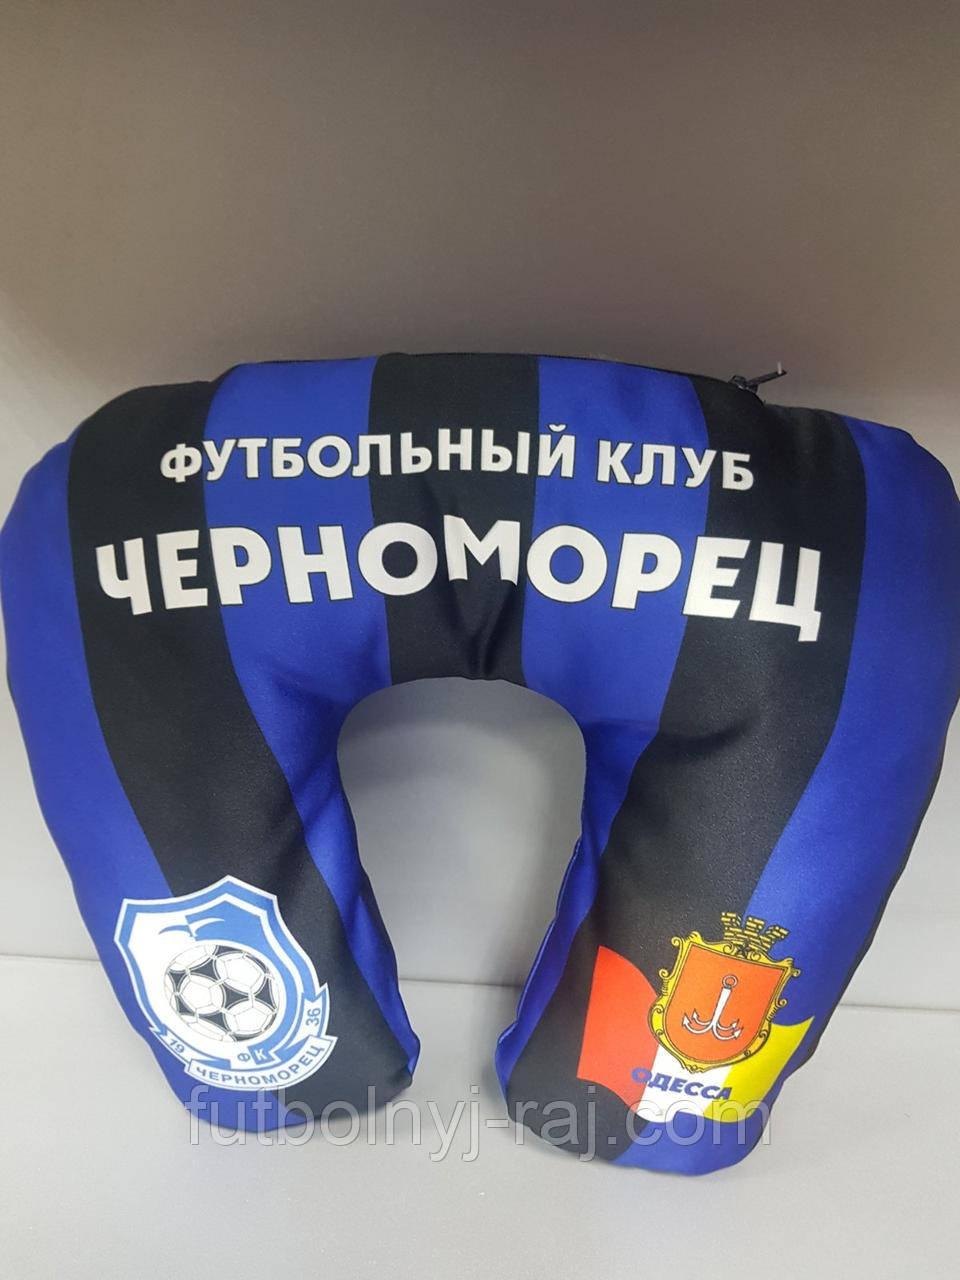 Подушка 35 х 30 см с символикой ФК Черноморец.